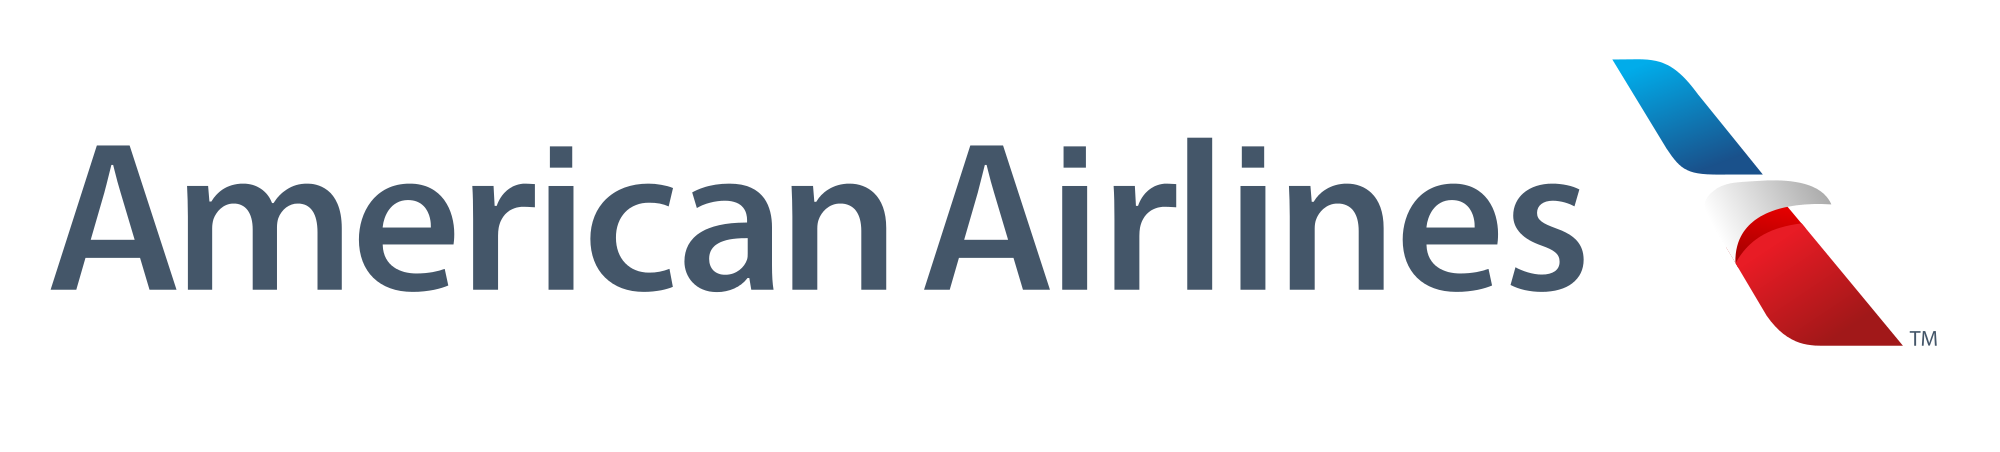 American Airline Logos Images   Joy Studio Design Gallery ...